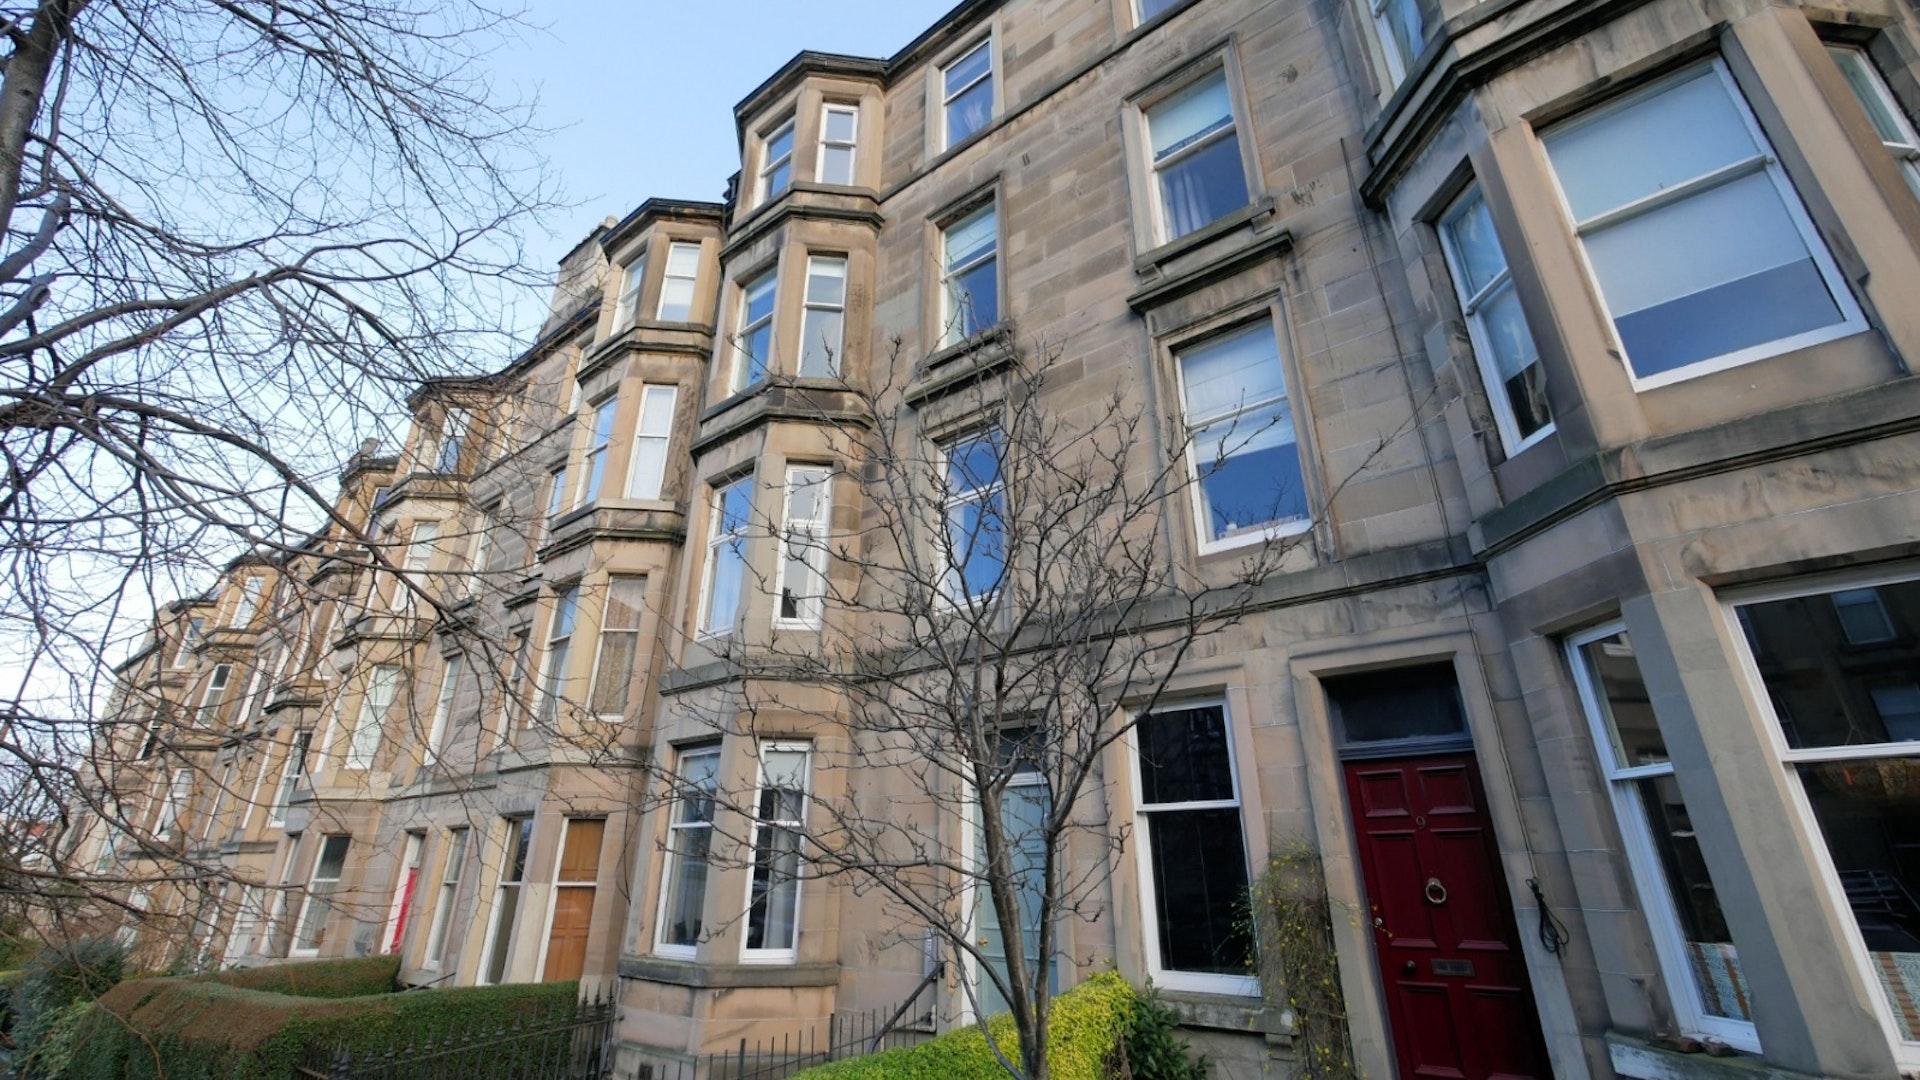 P435: Wellington Street, London Road, Edinburgh